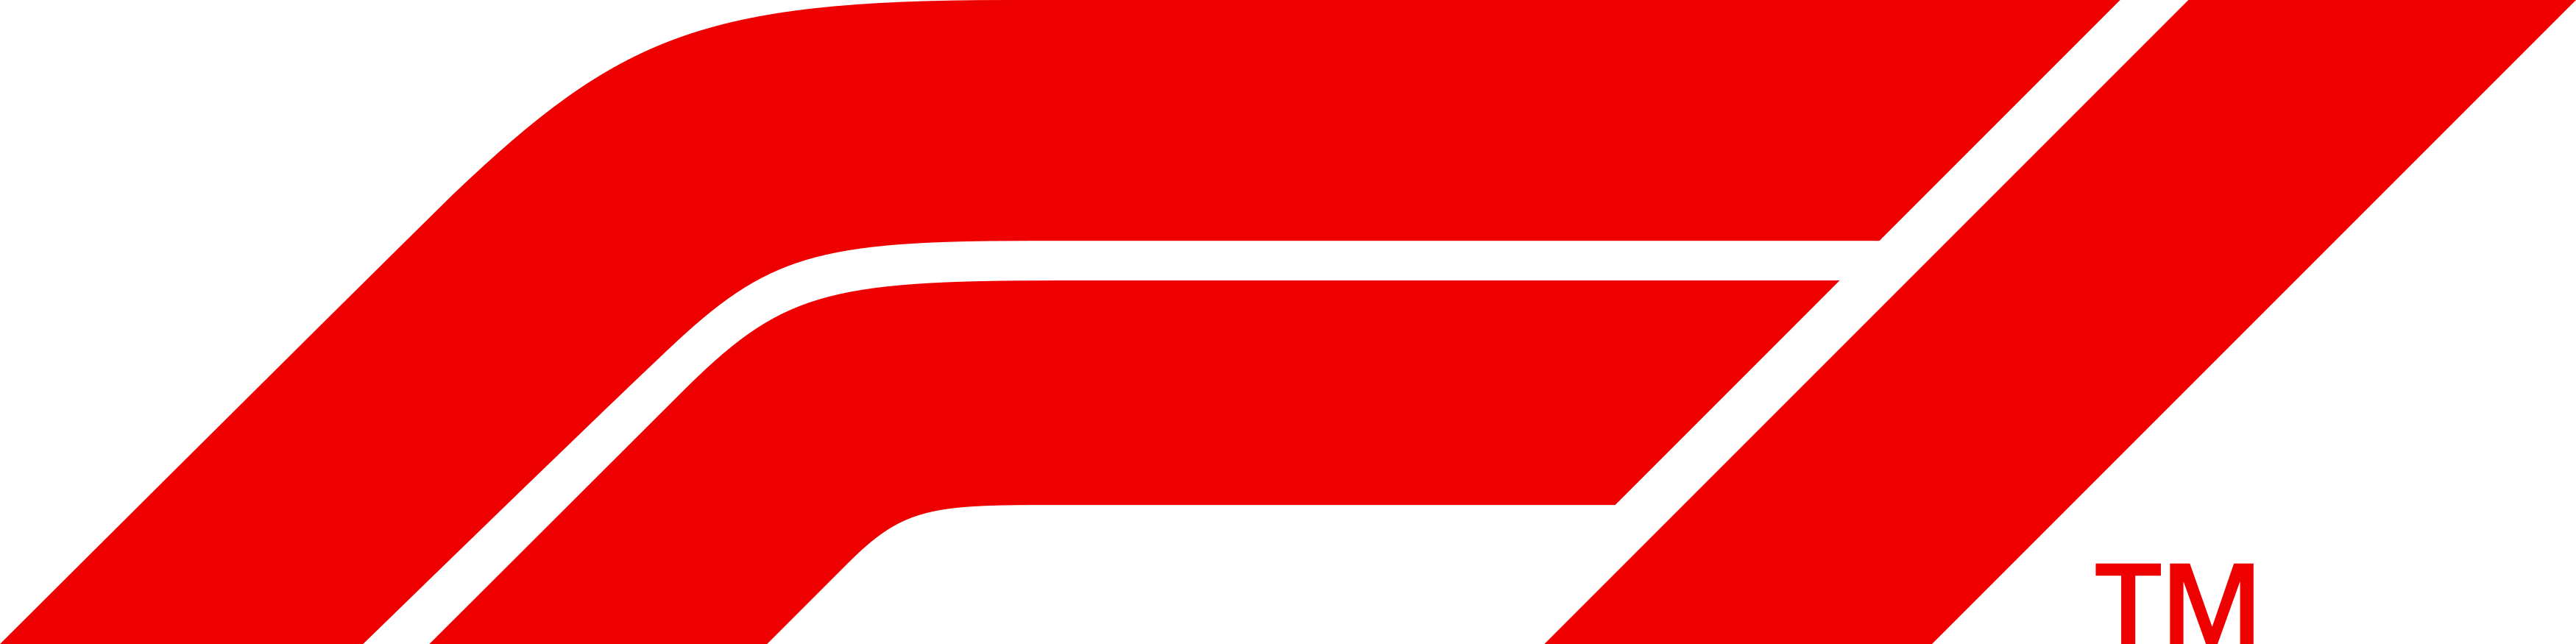 F1 Formula 1 Logo.